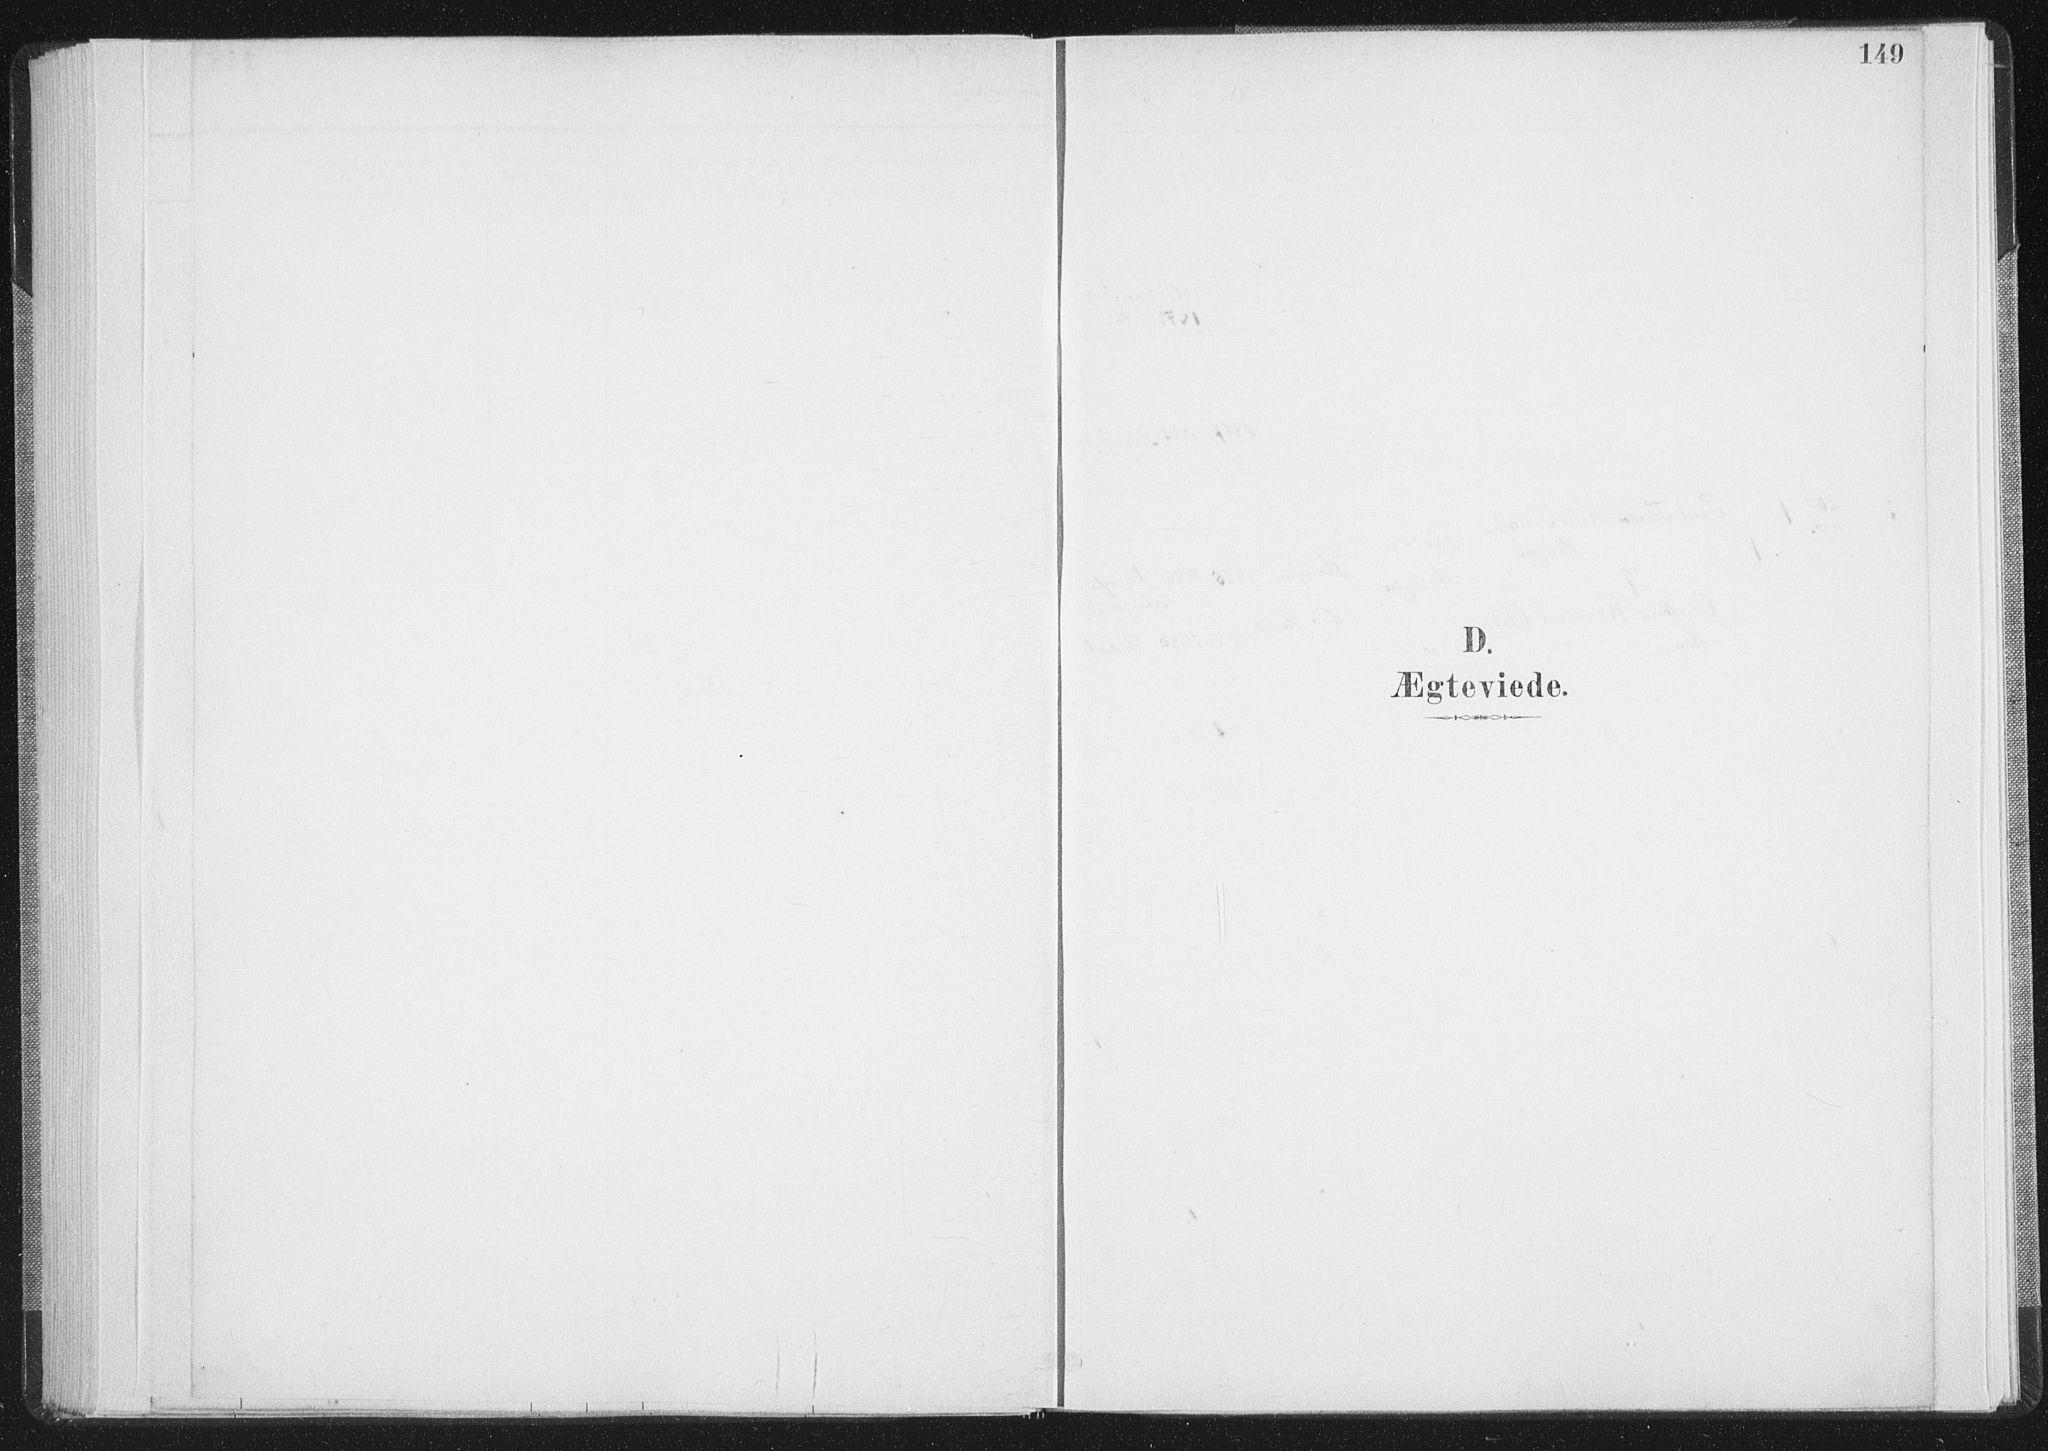 SAT, Ministerialprotokoller, klokkerbøker og fødselsregistre - Nordland, 898/L1422: Ministerialbok nr. 898A02, 1887-1908, s. 149